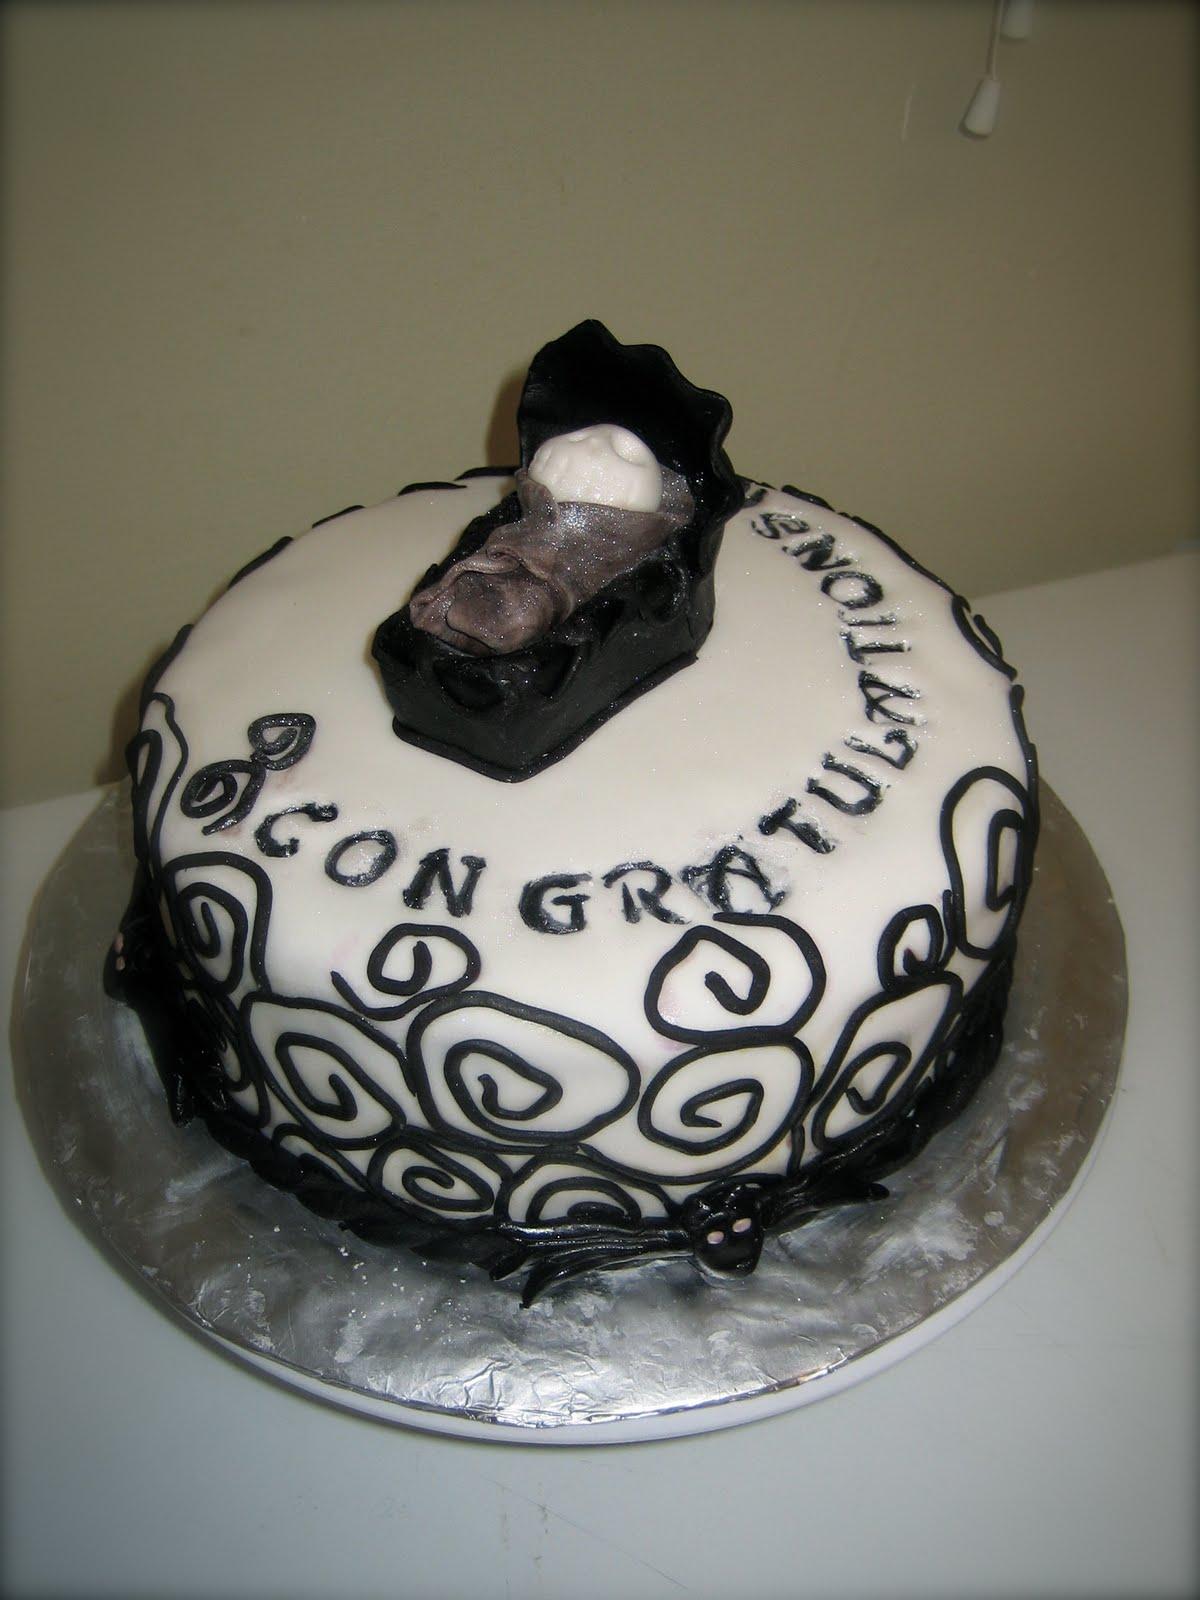 Sweet & Simple - Custom Cake Design: - 160.1KB